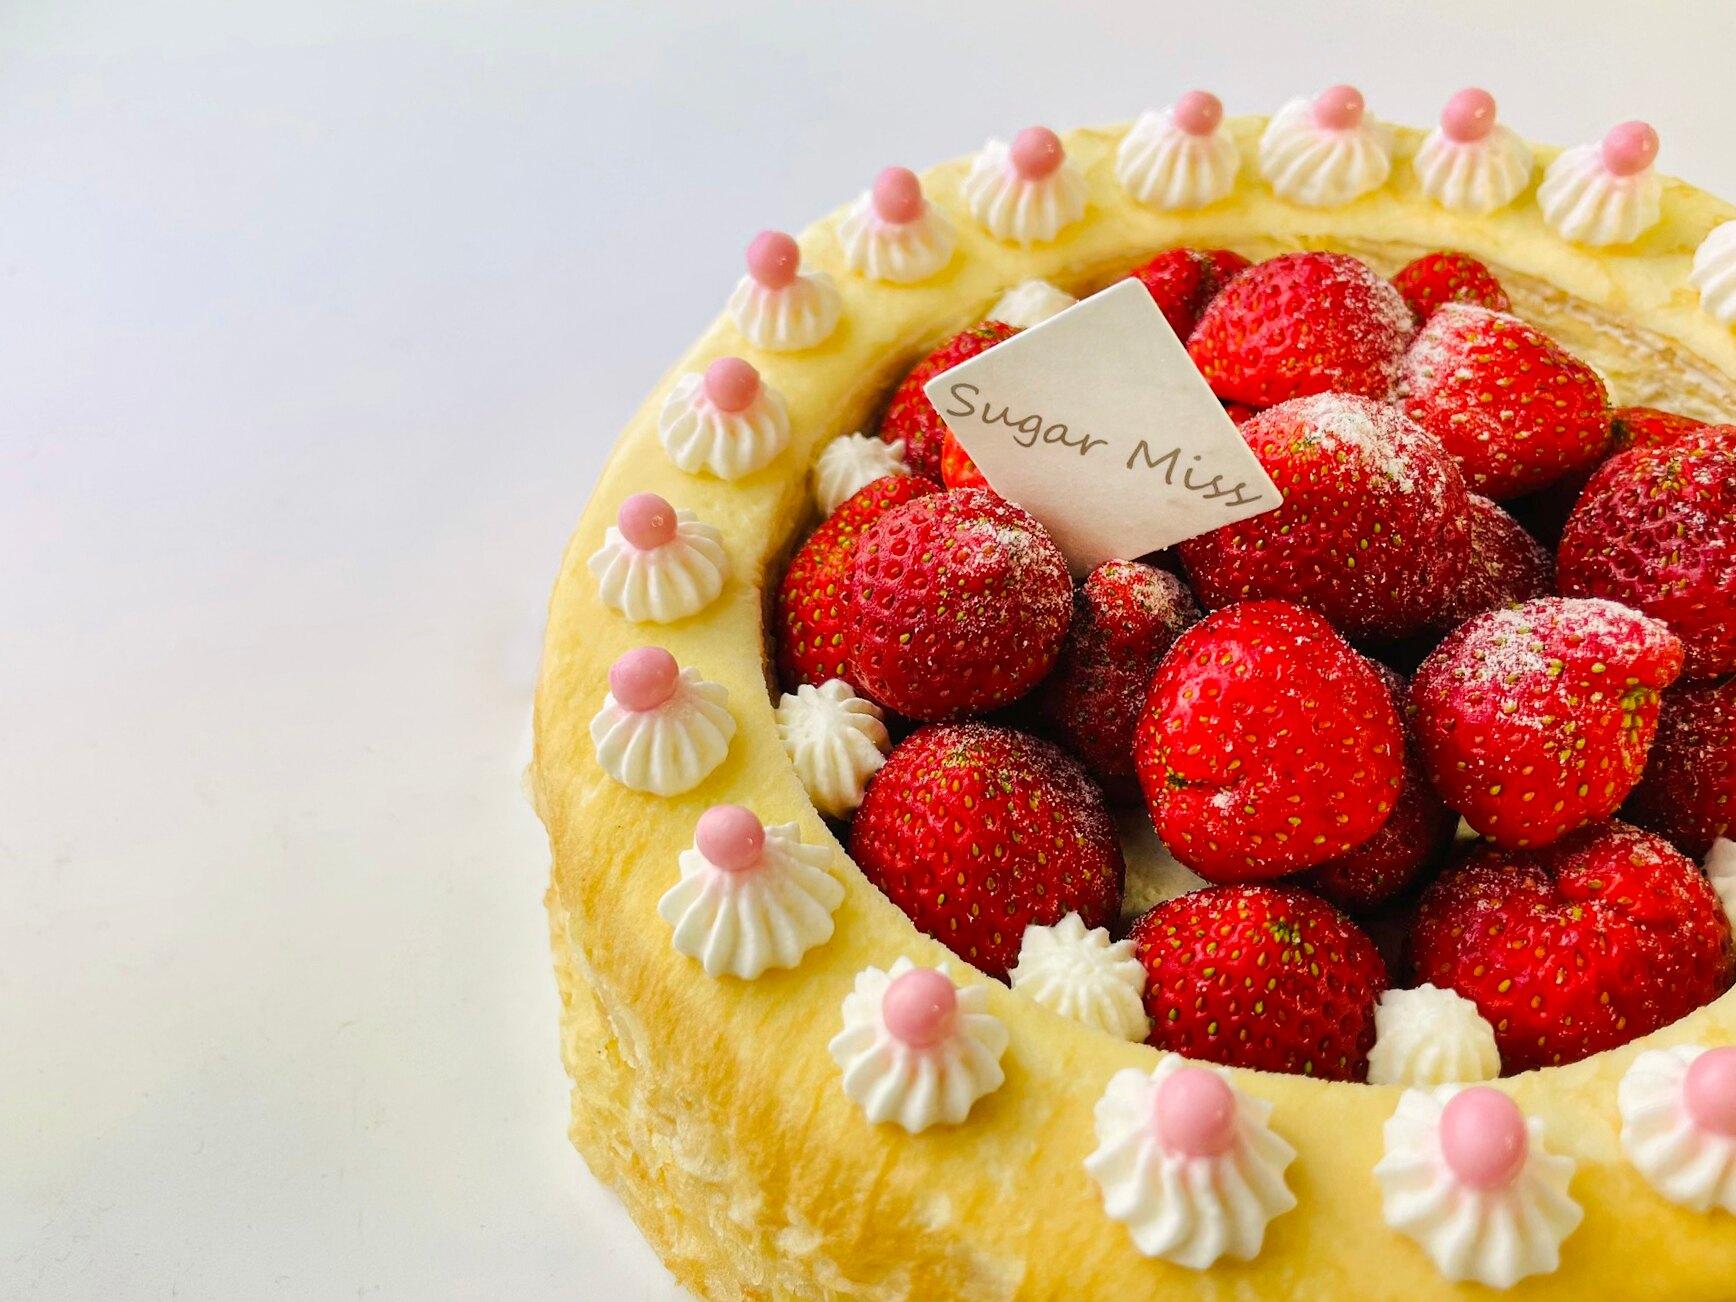 【Sugar miss】草莓千層蛋糕 6吋